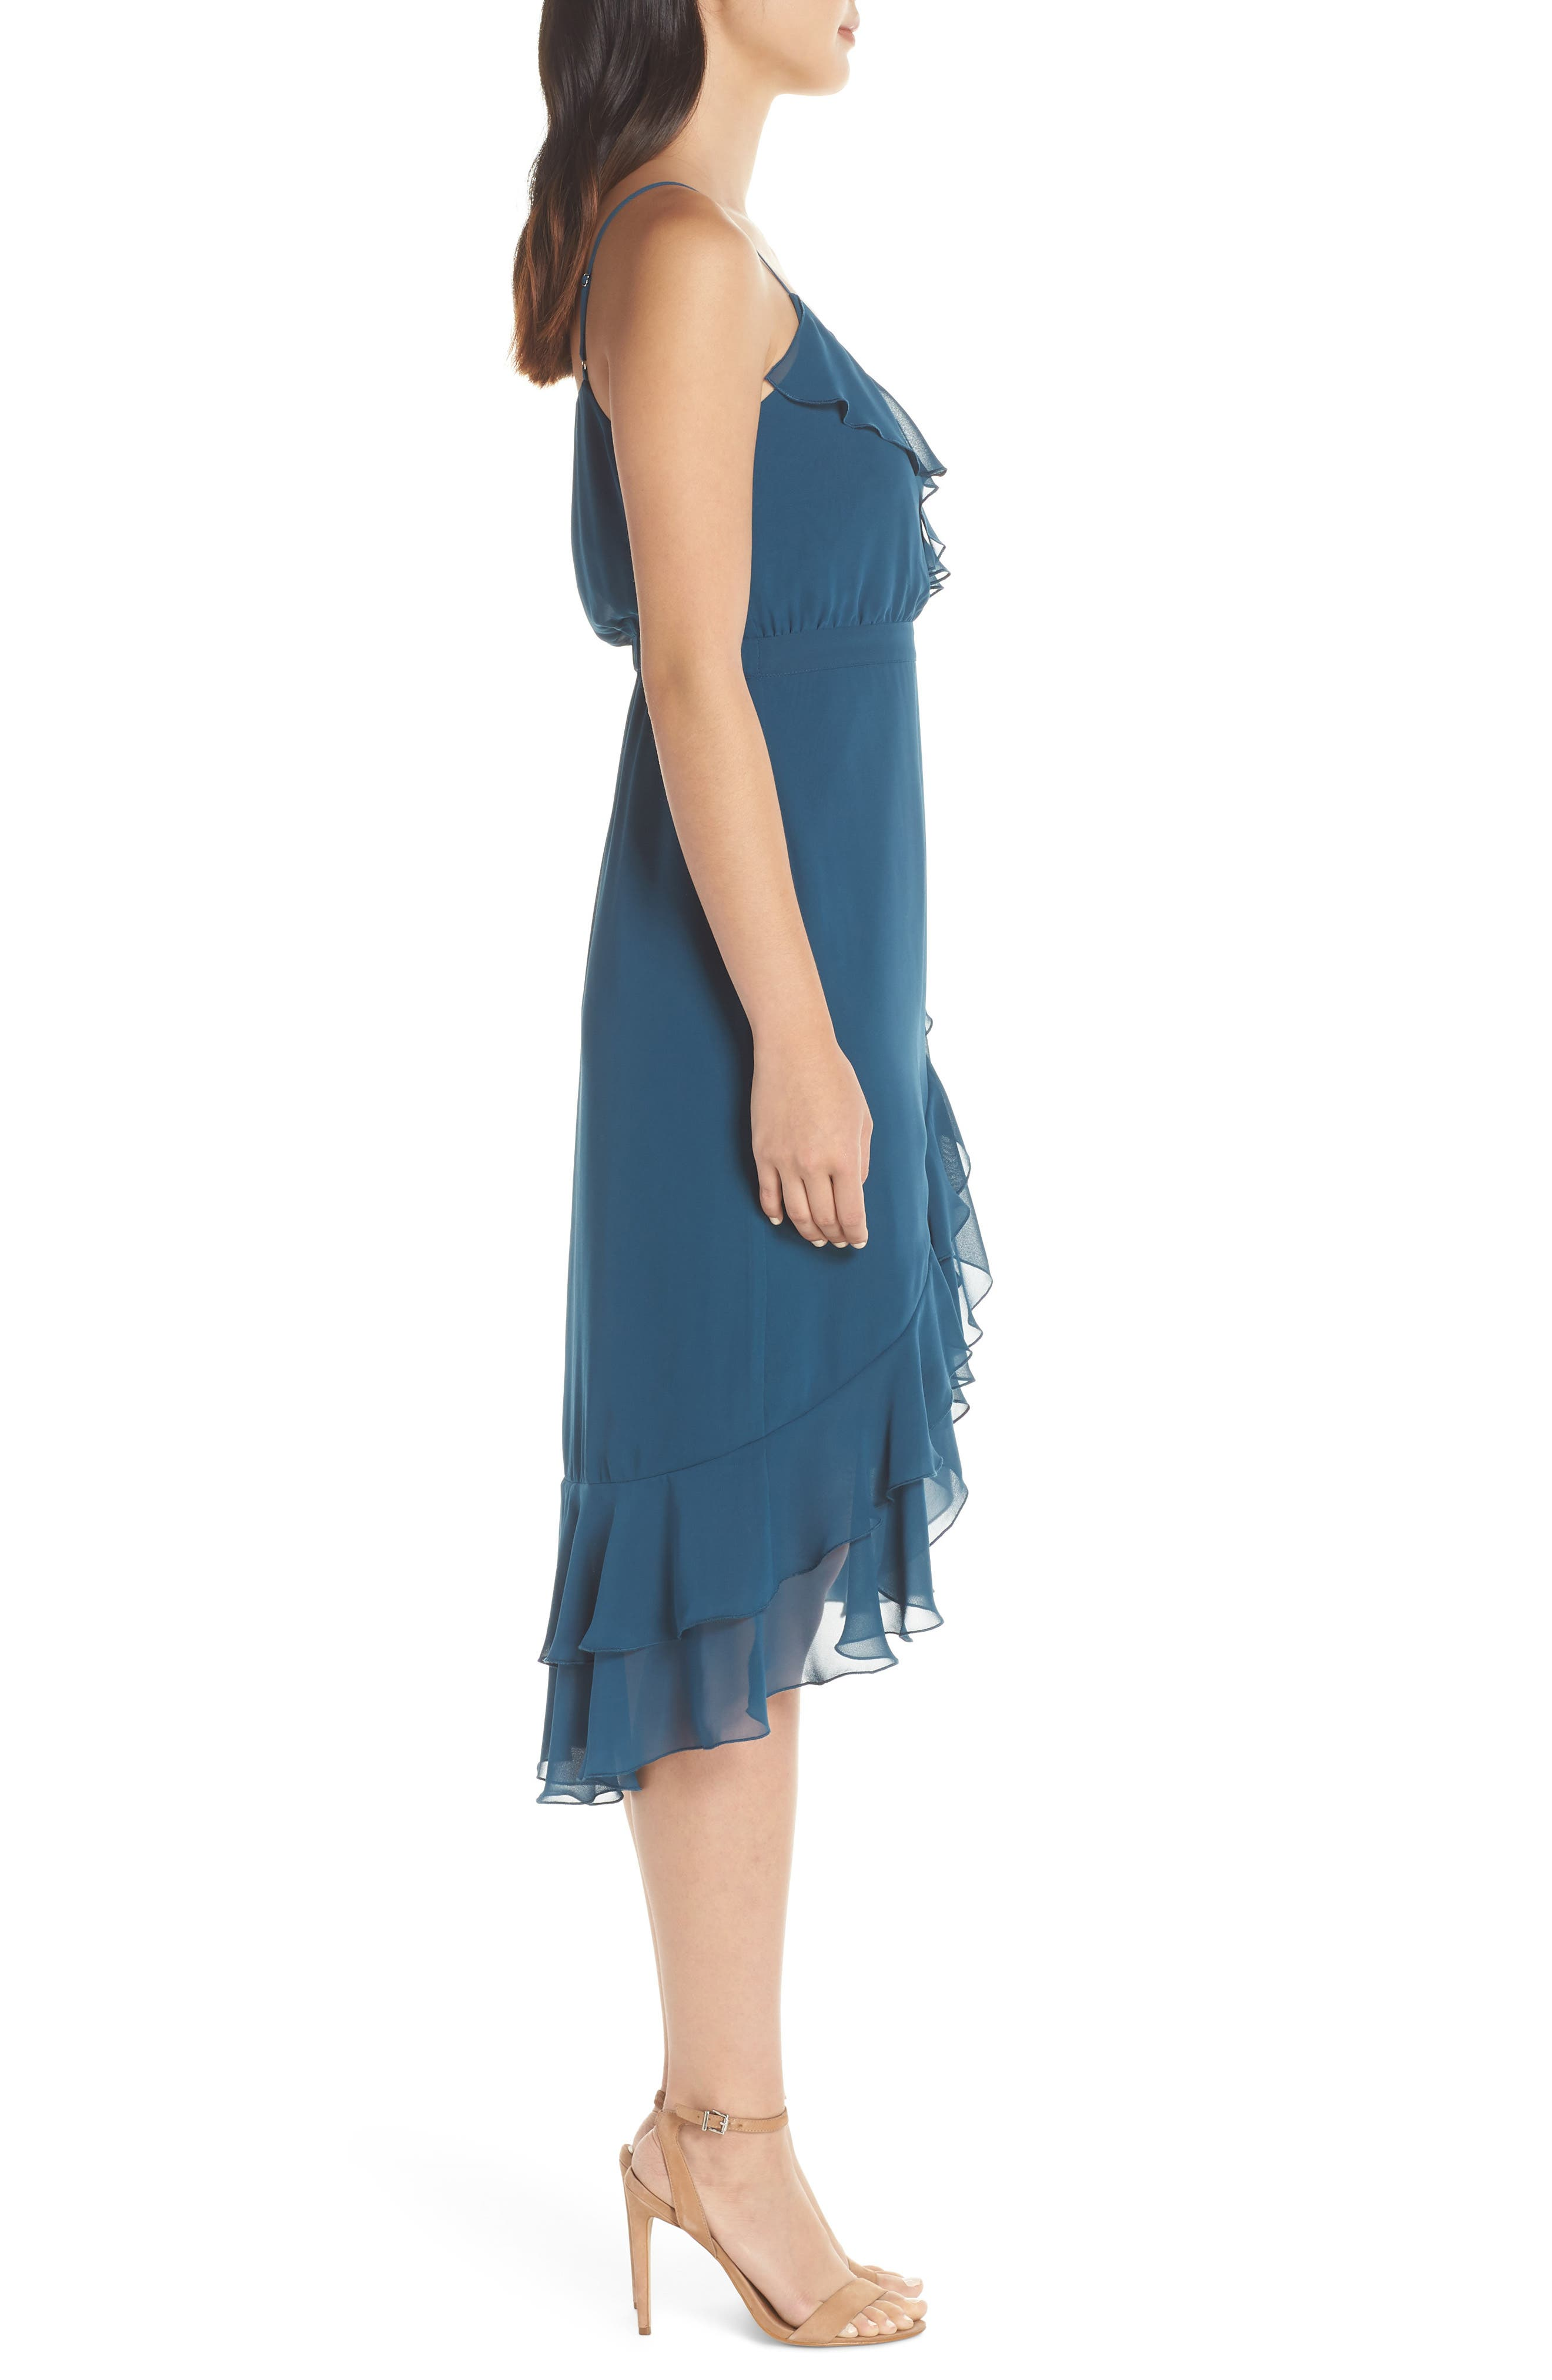 ALI & JAY, Pretty Lady High/Low Dress, Alternate thumbnail 4, color, 400